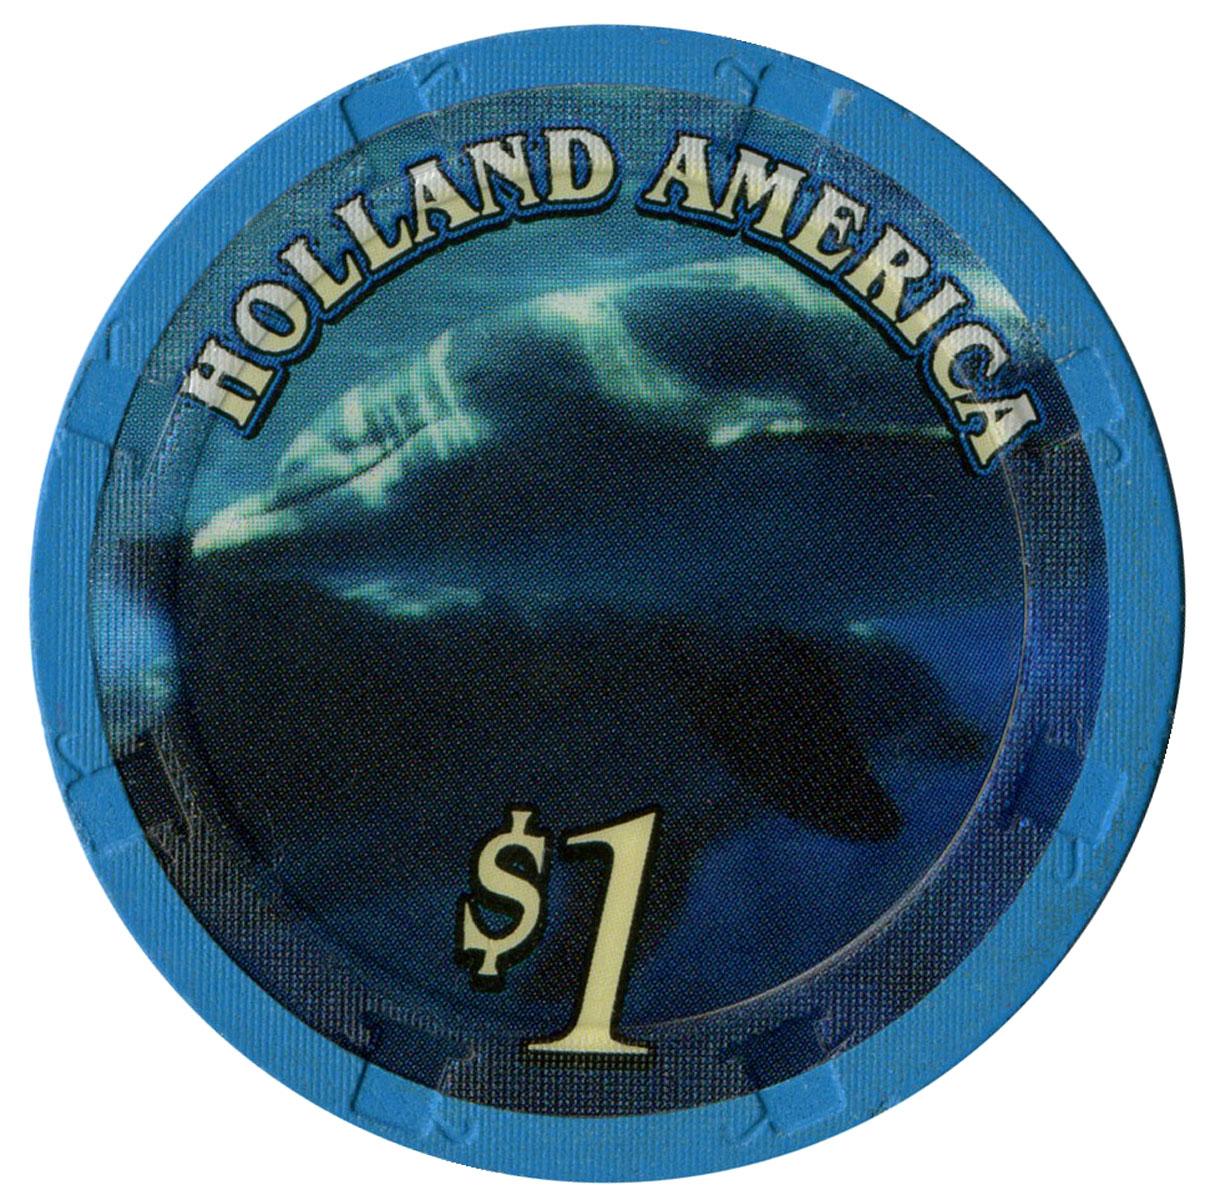 Holland america casino currency thousand islands casino poker tournaments